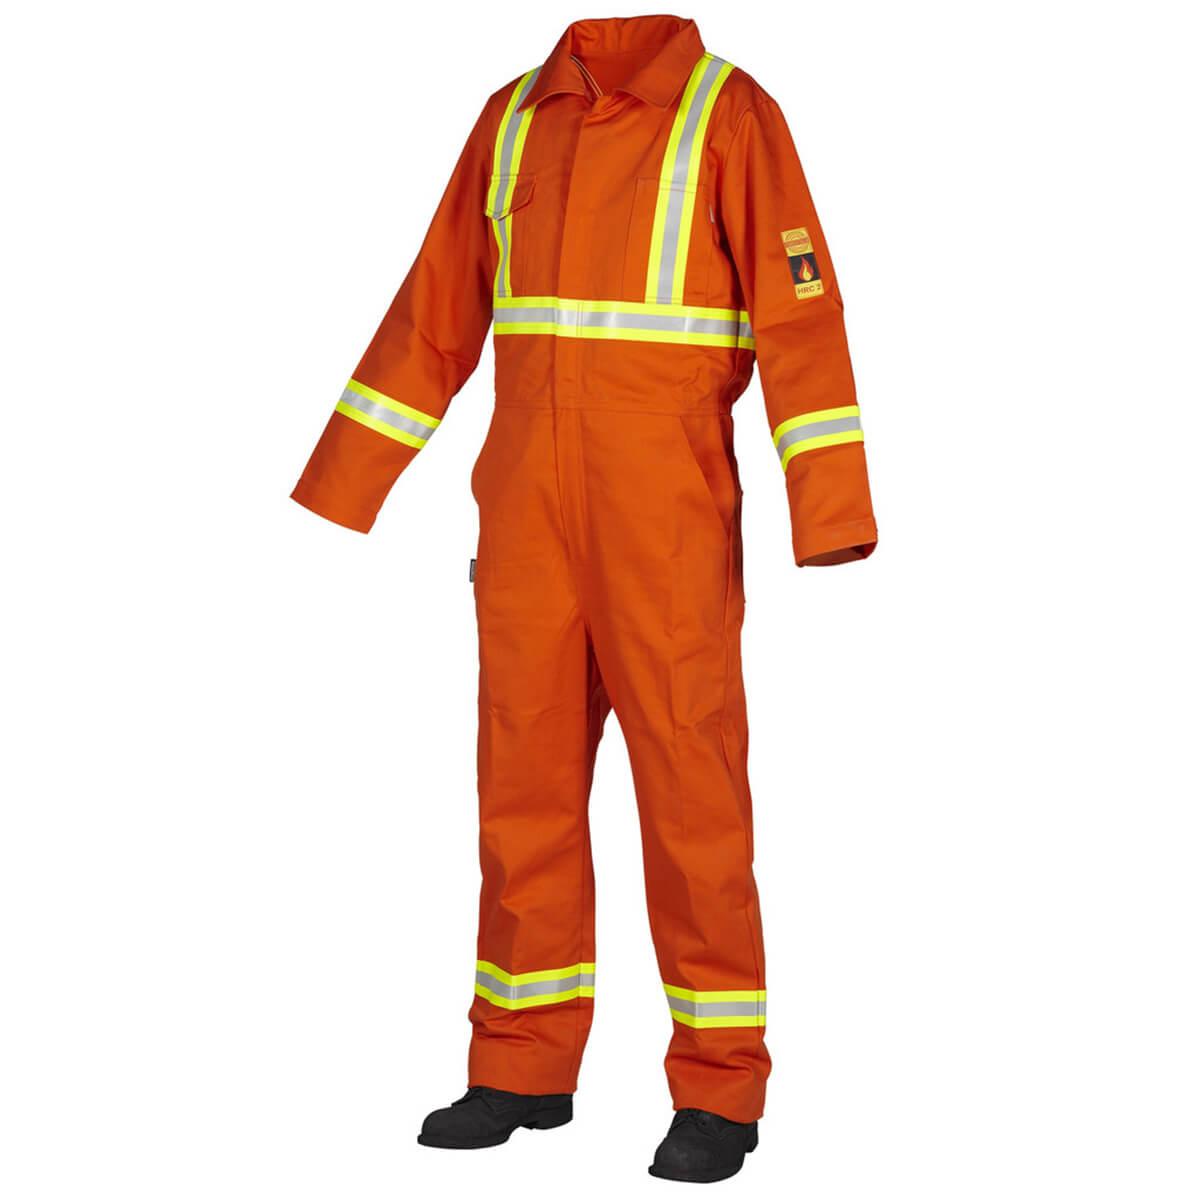 Fire Resistant Coverall - Orange